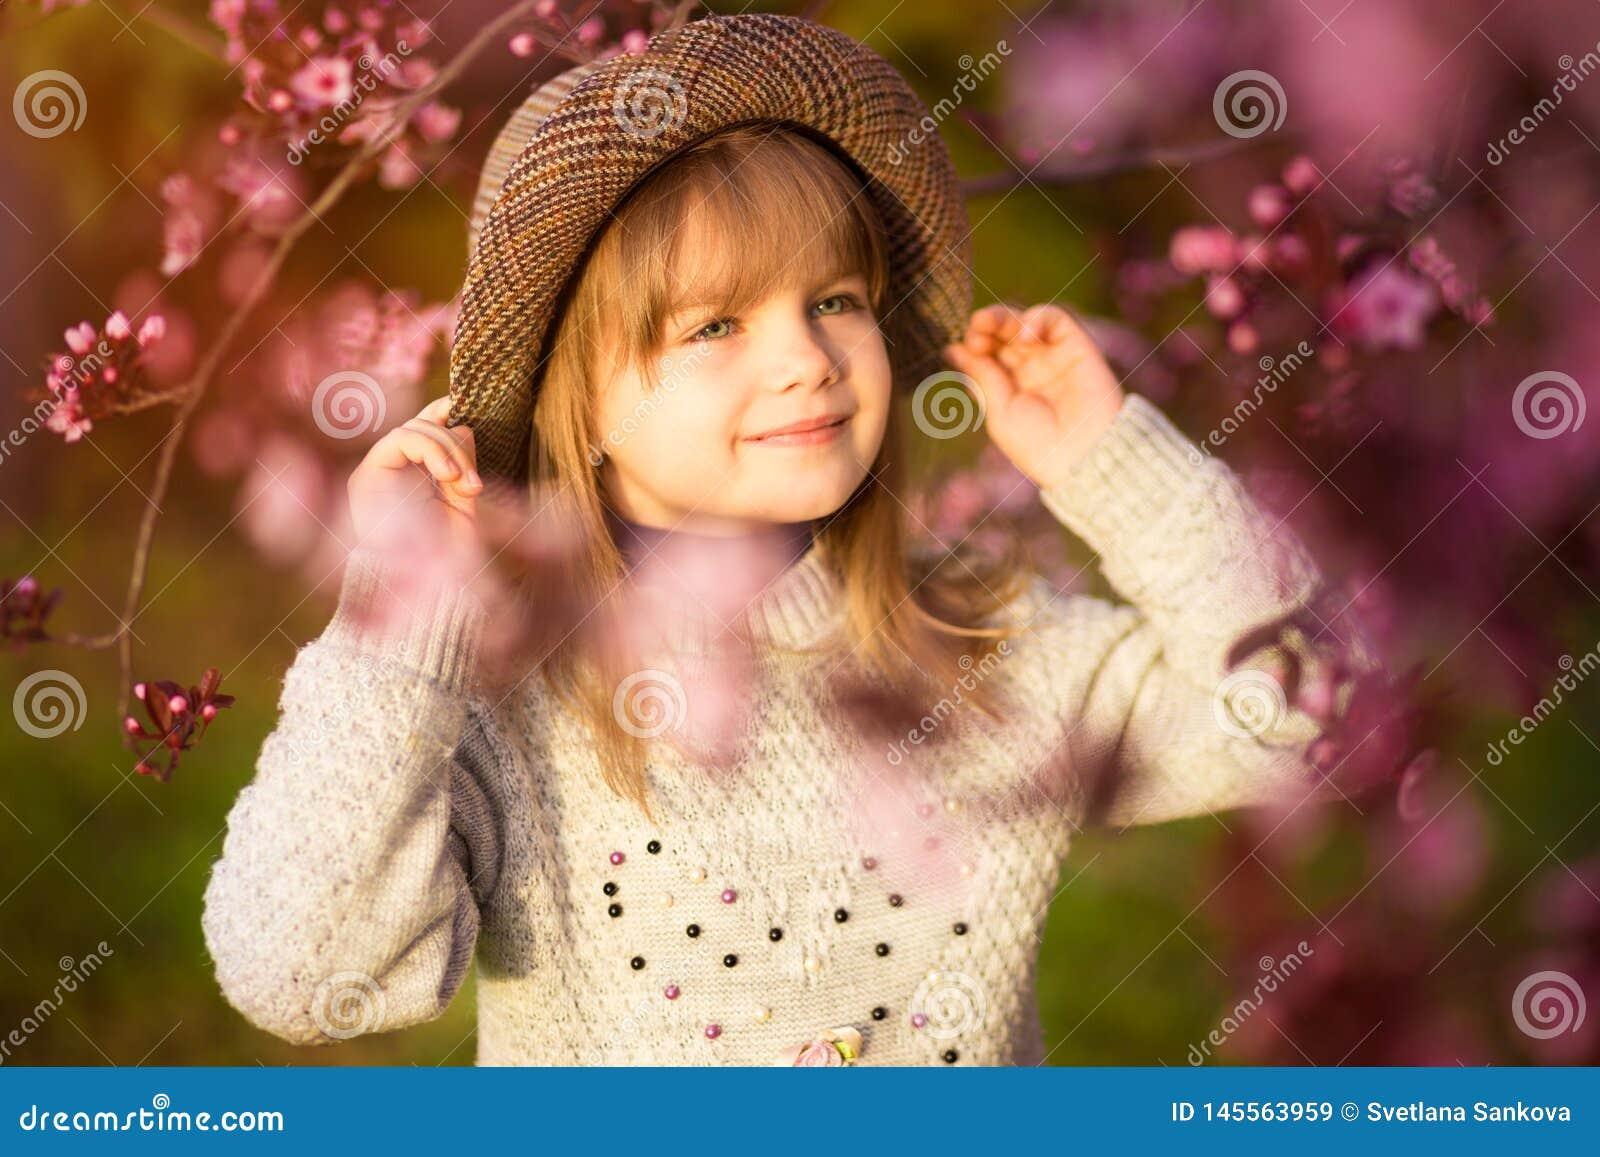 Spring portrait, adorable little girl in hat walk in blossom tree garden on sunset